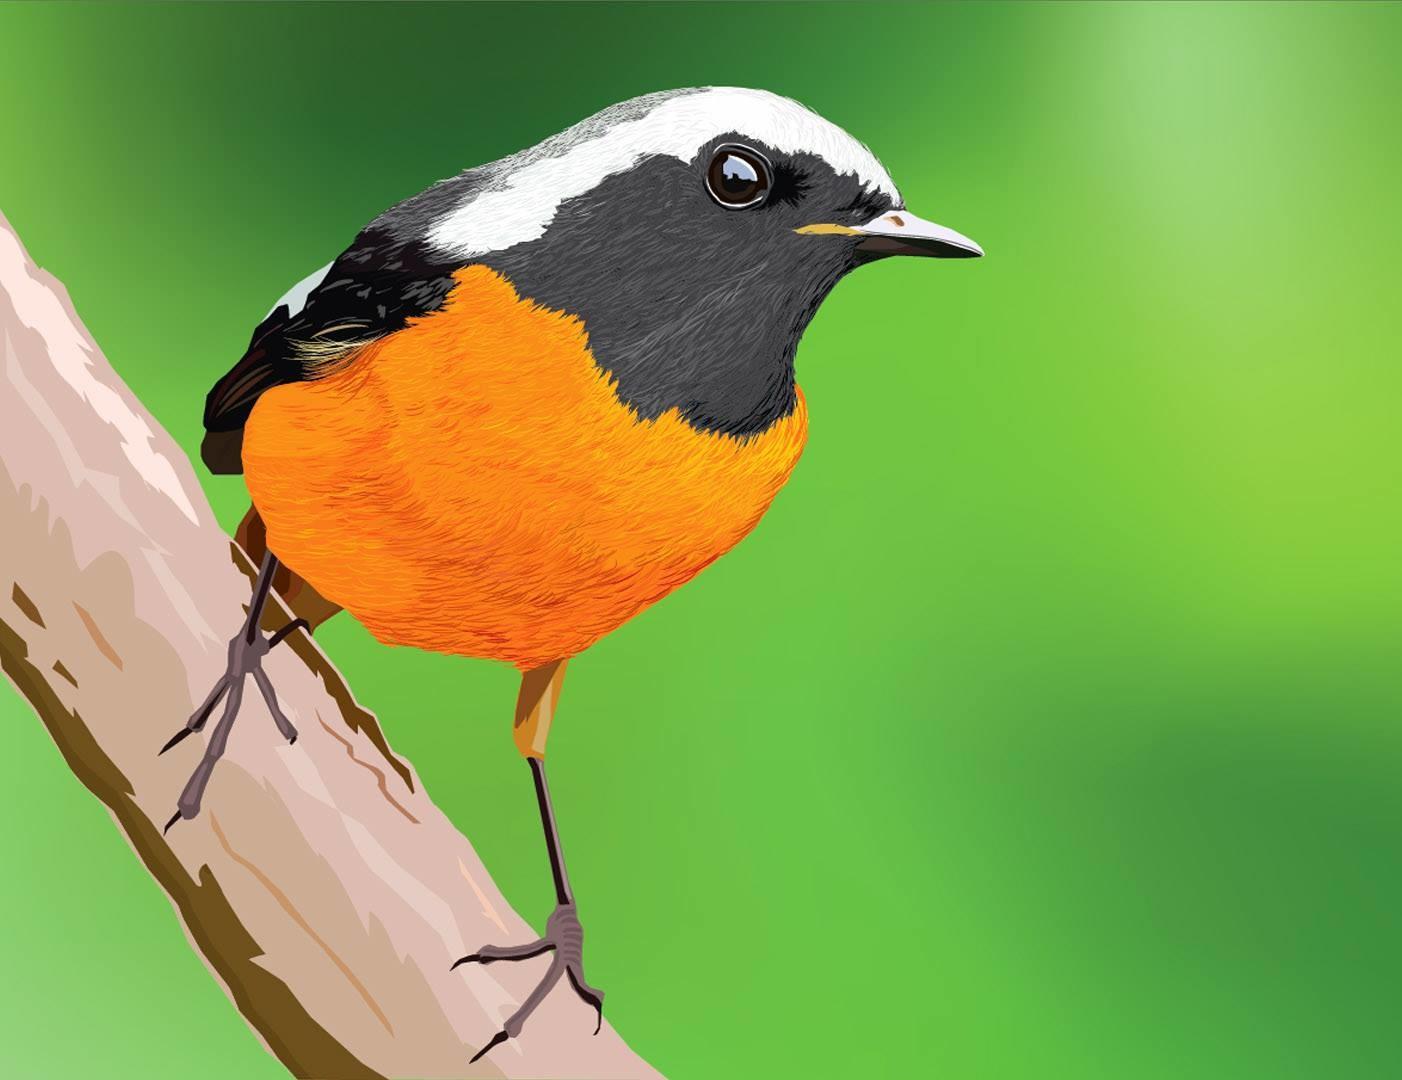 Rajesh sawant bird 2